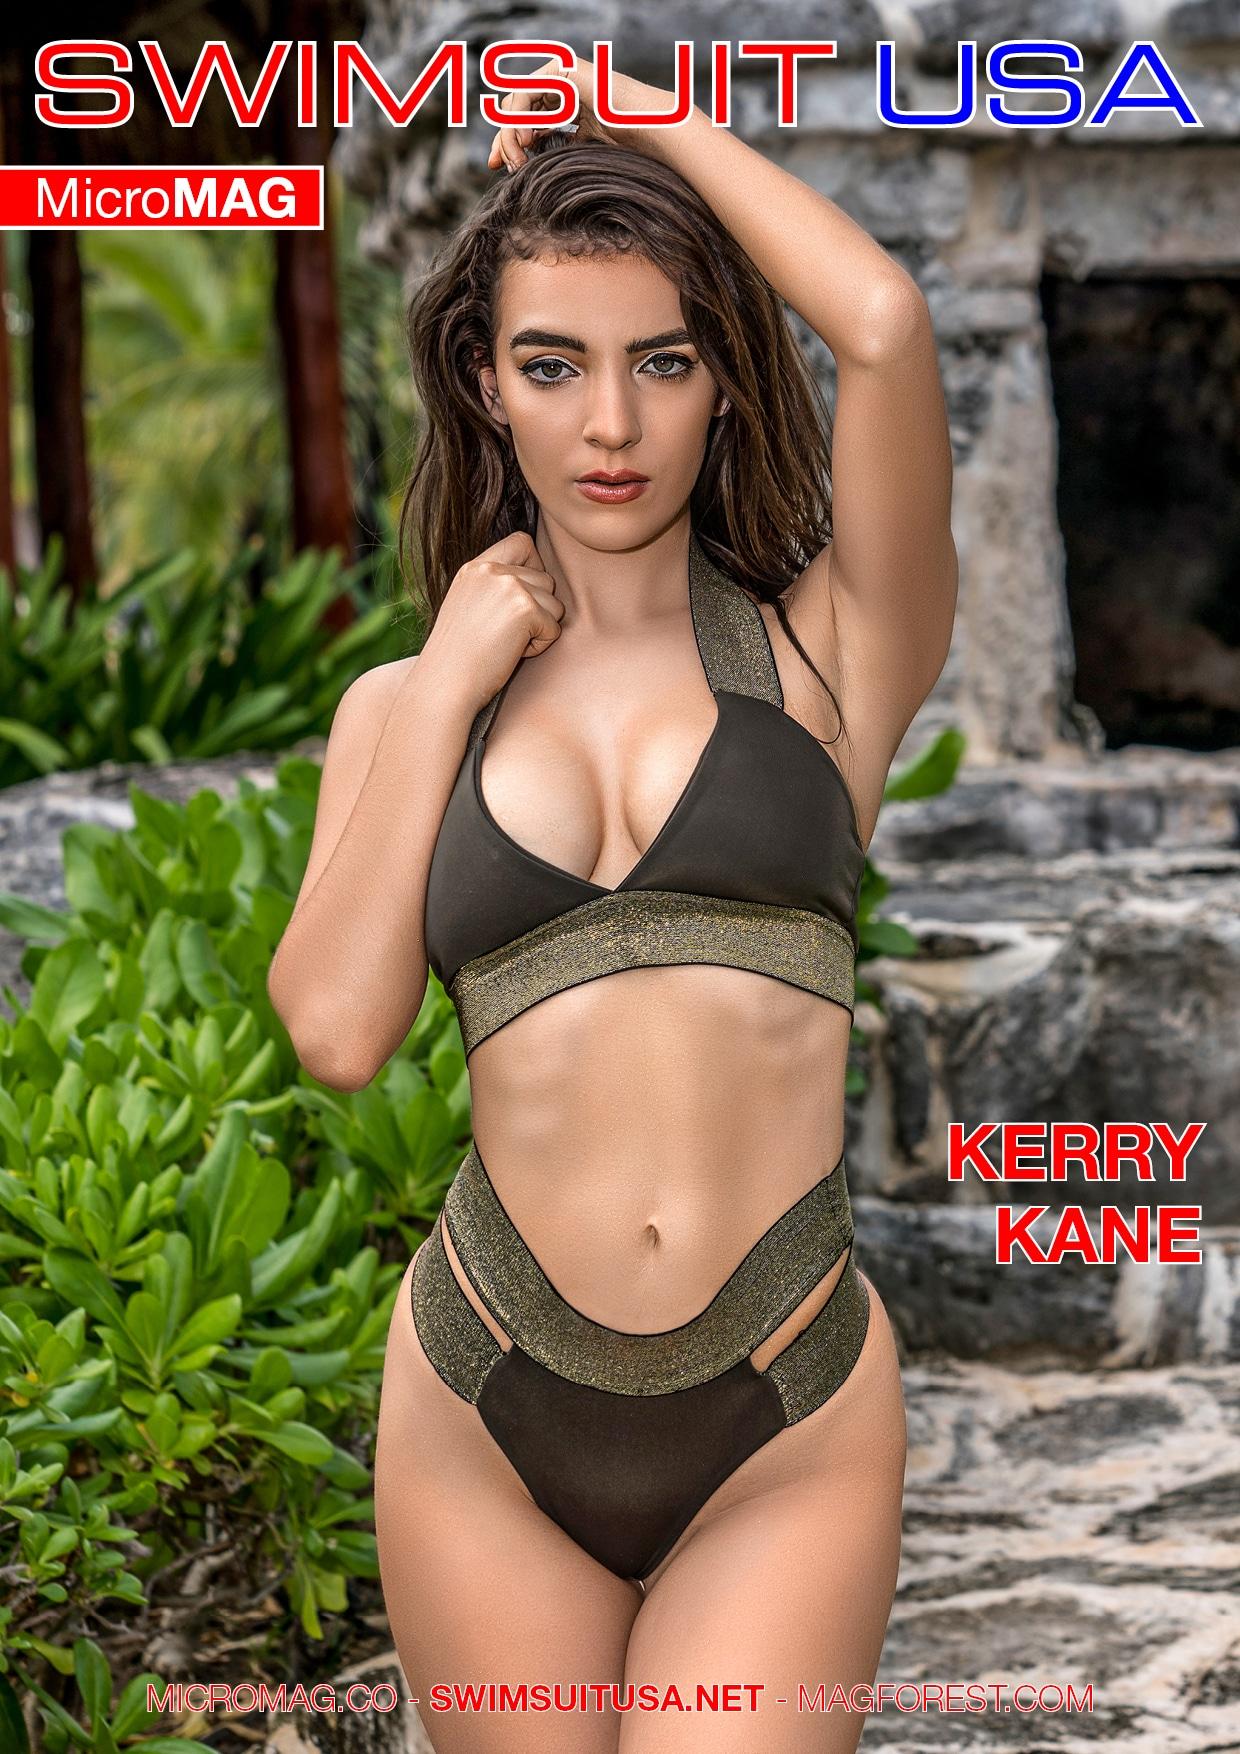 Swimsuit USA MicroMAG - Kerry Kane